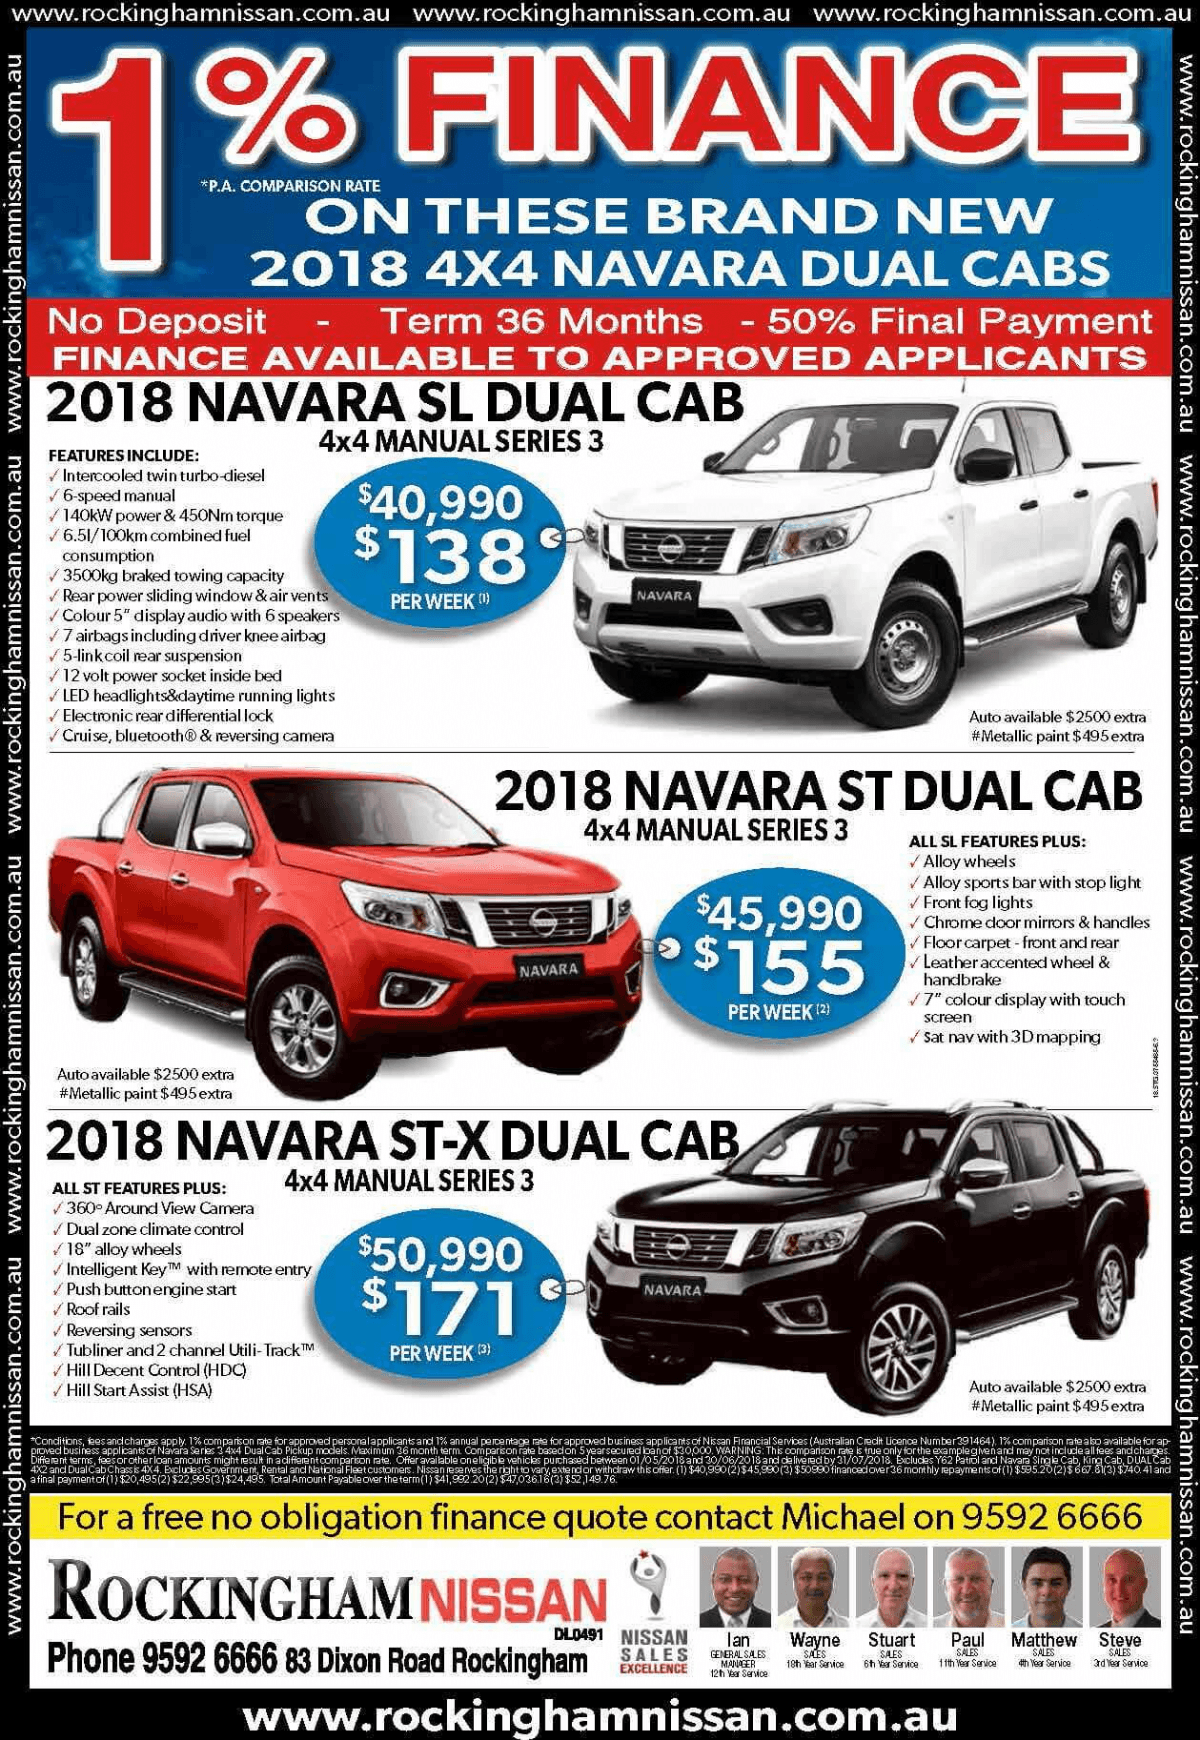 Nissan-navara-special-offer-rockingham-nissan